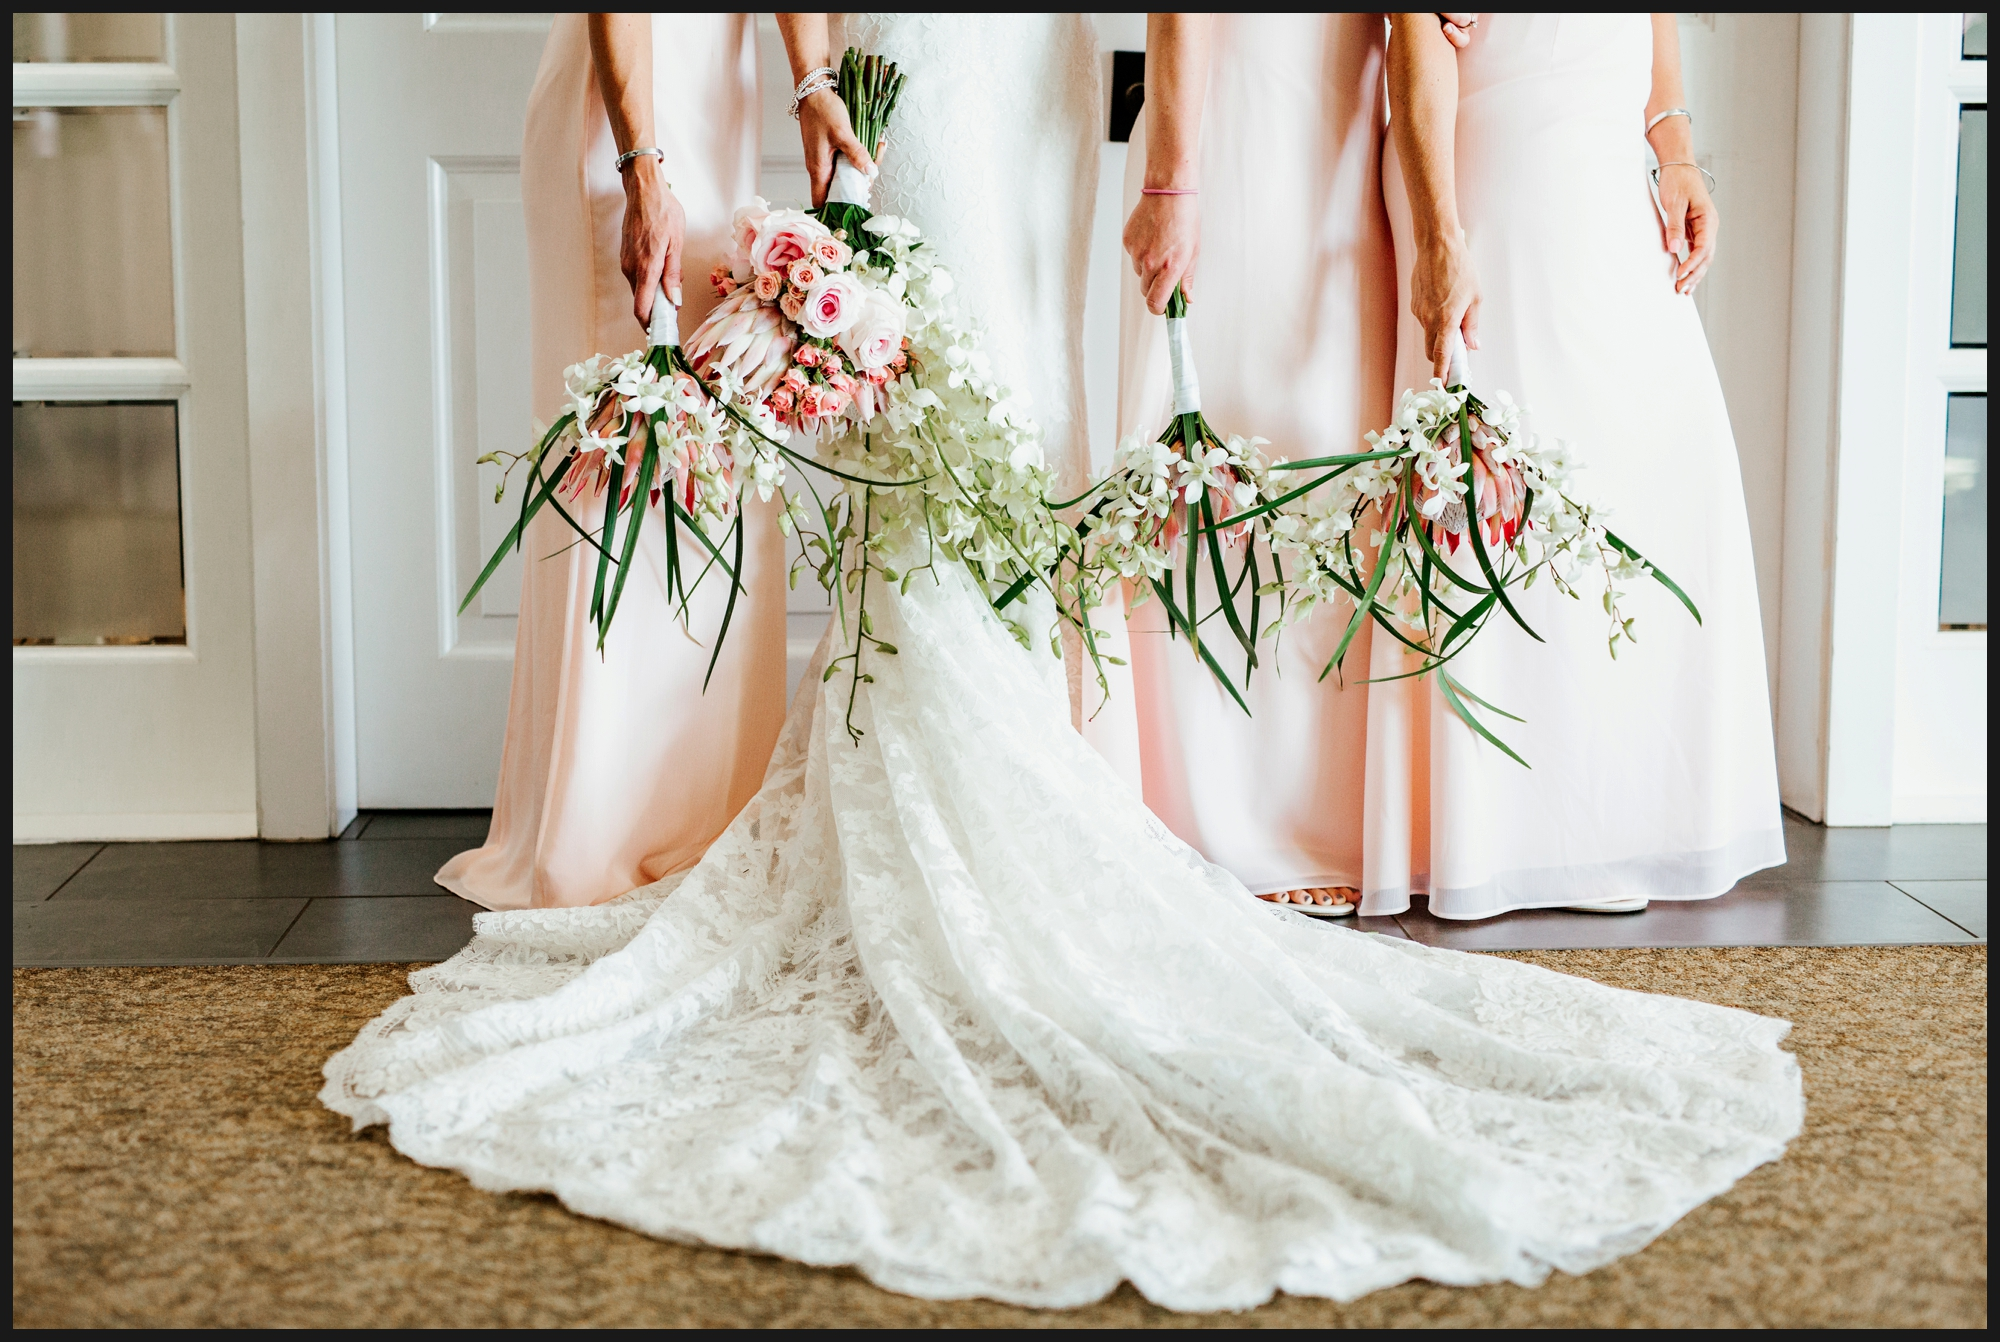 Orlando-Wedding-Photographer-destination-wedding-photographer-florida-wedding-photographer-hawaii-wedding-photographer_0047.jpg